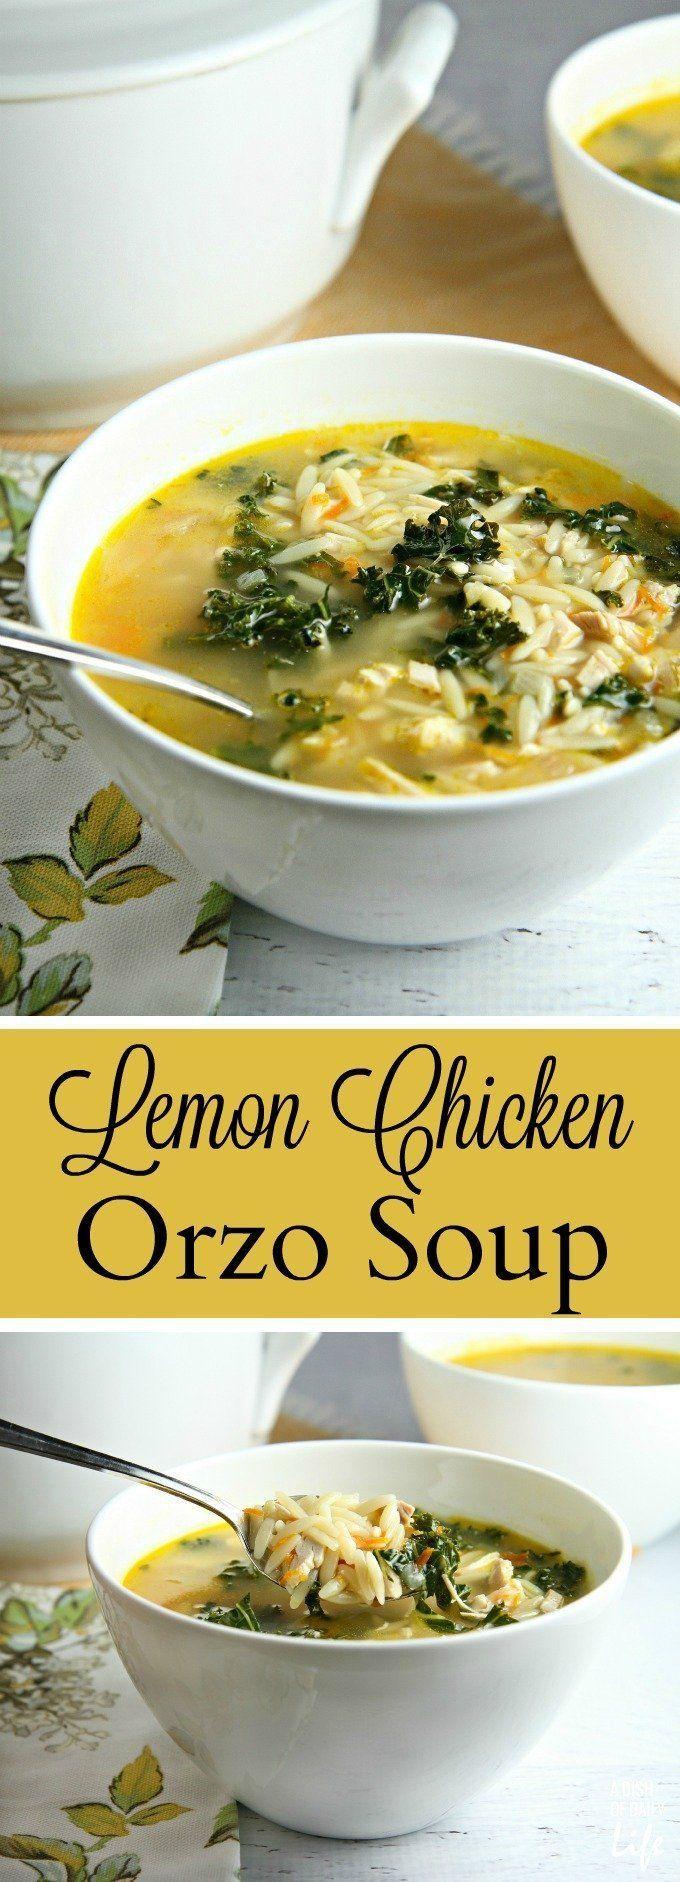 Mar 28, 2020 – Lemon Chicken Orzo Soup recipe – A Dish of Daily Life